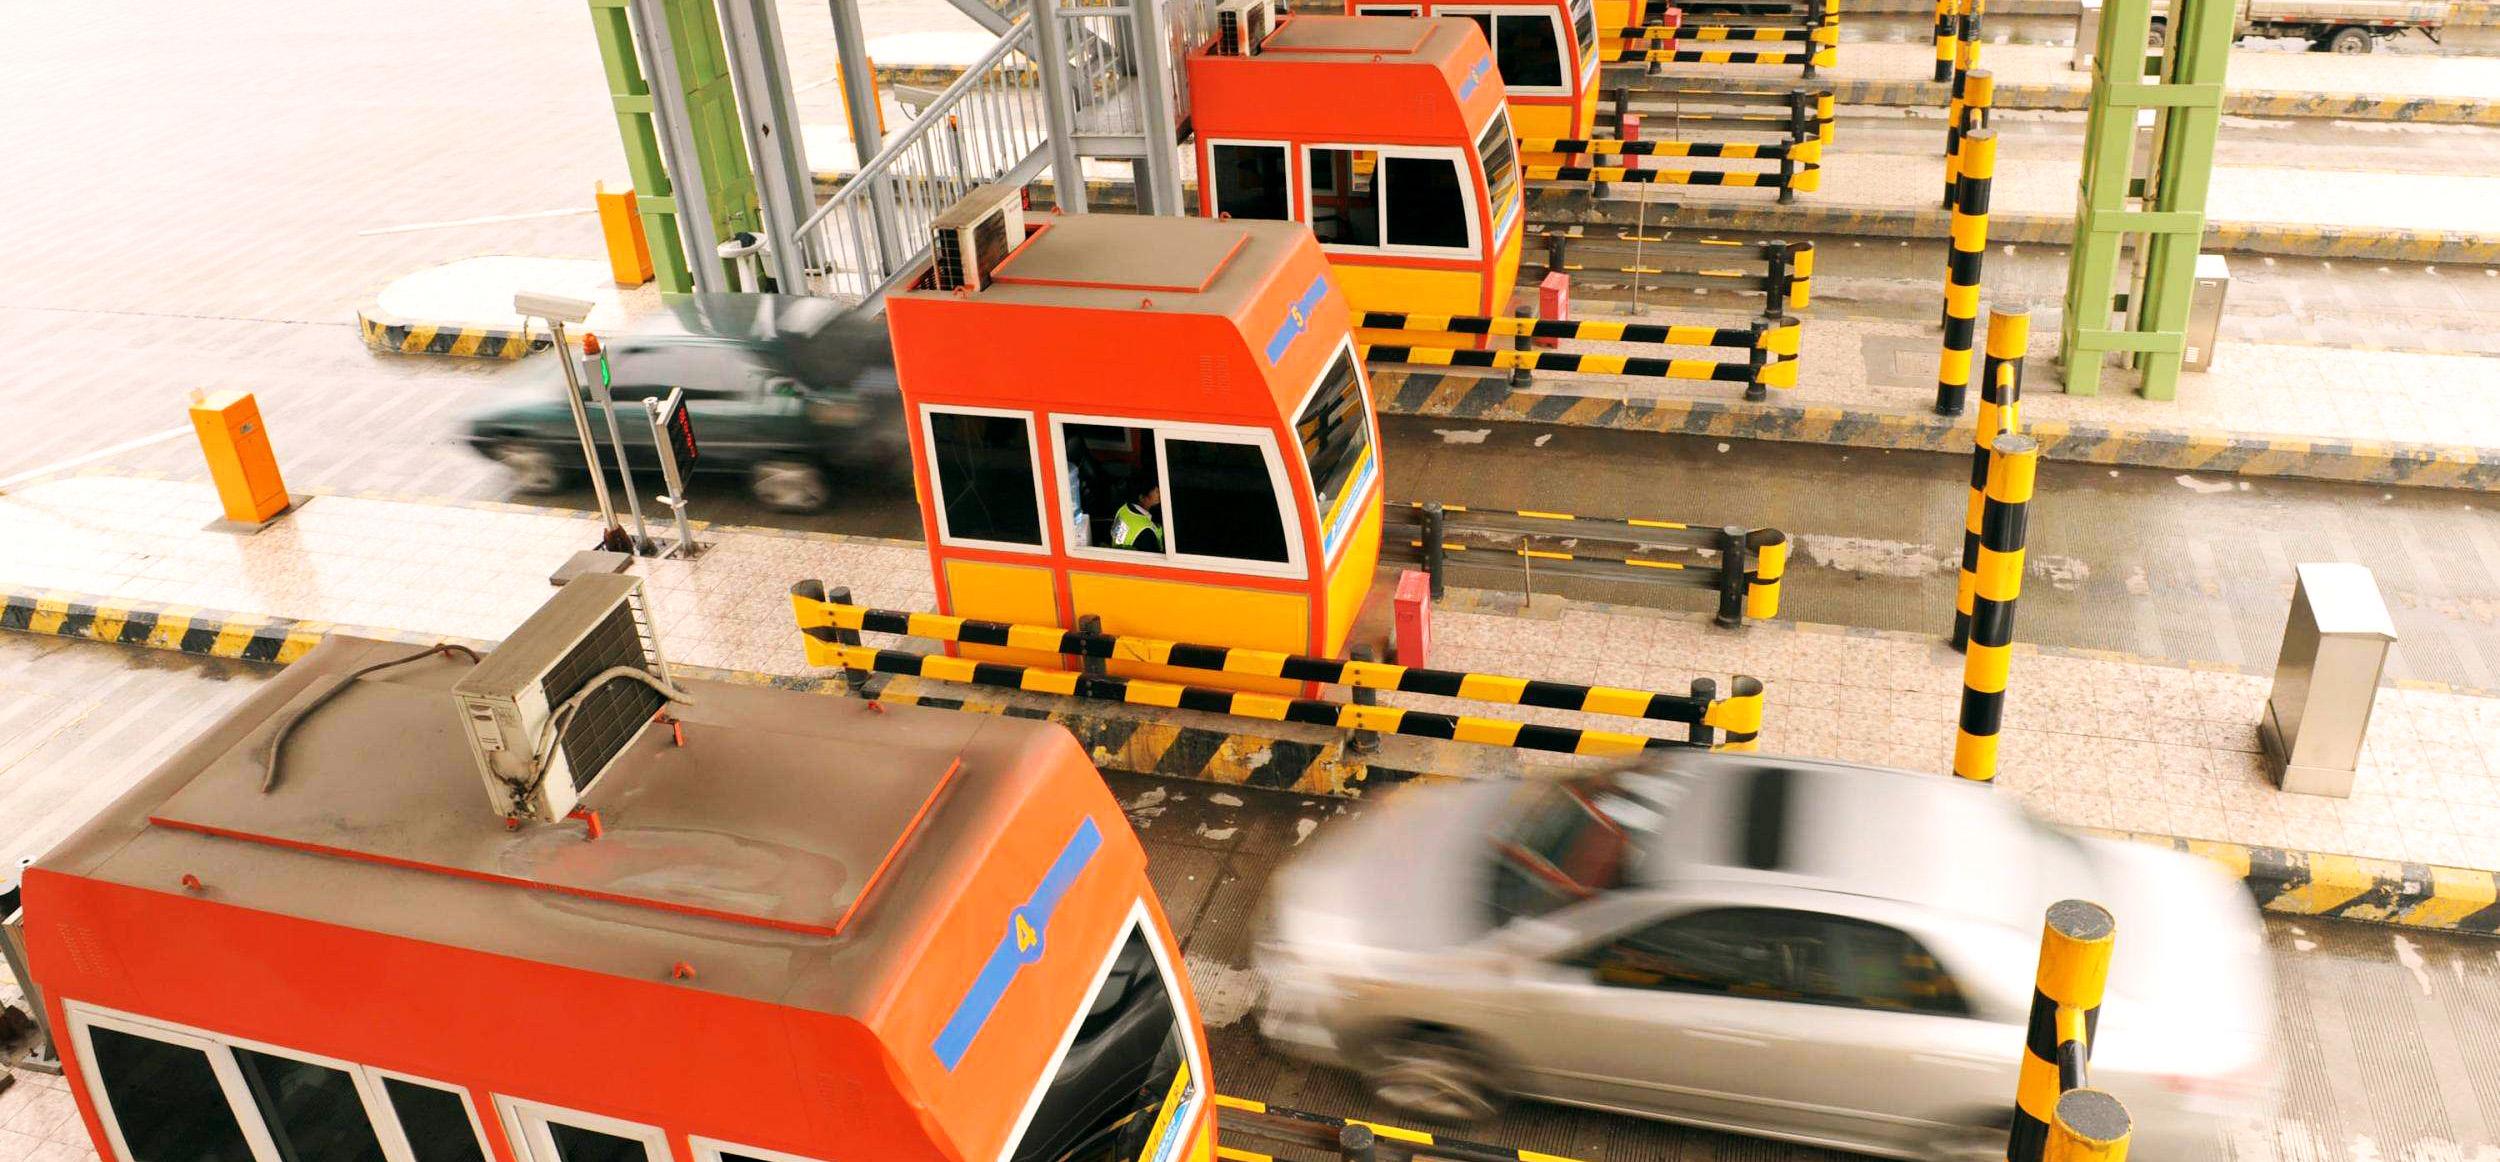 loop detector traffic control system